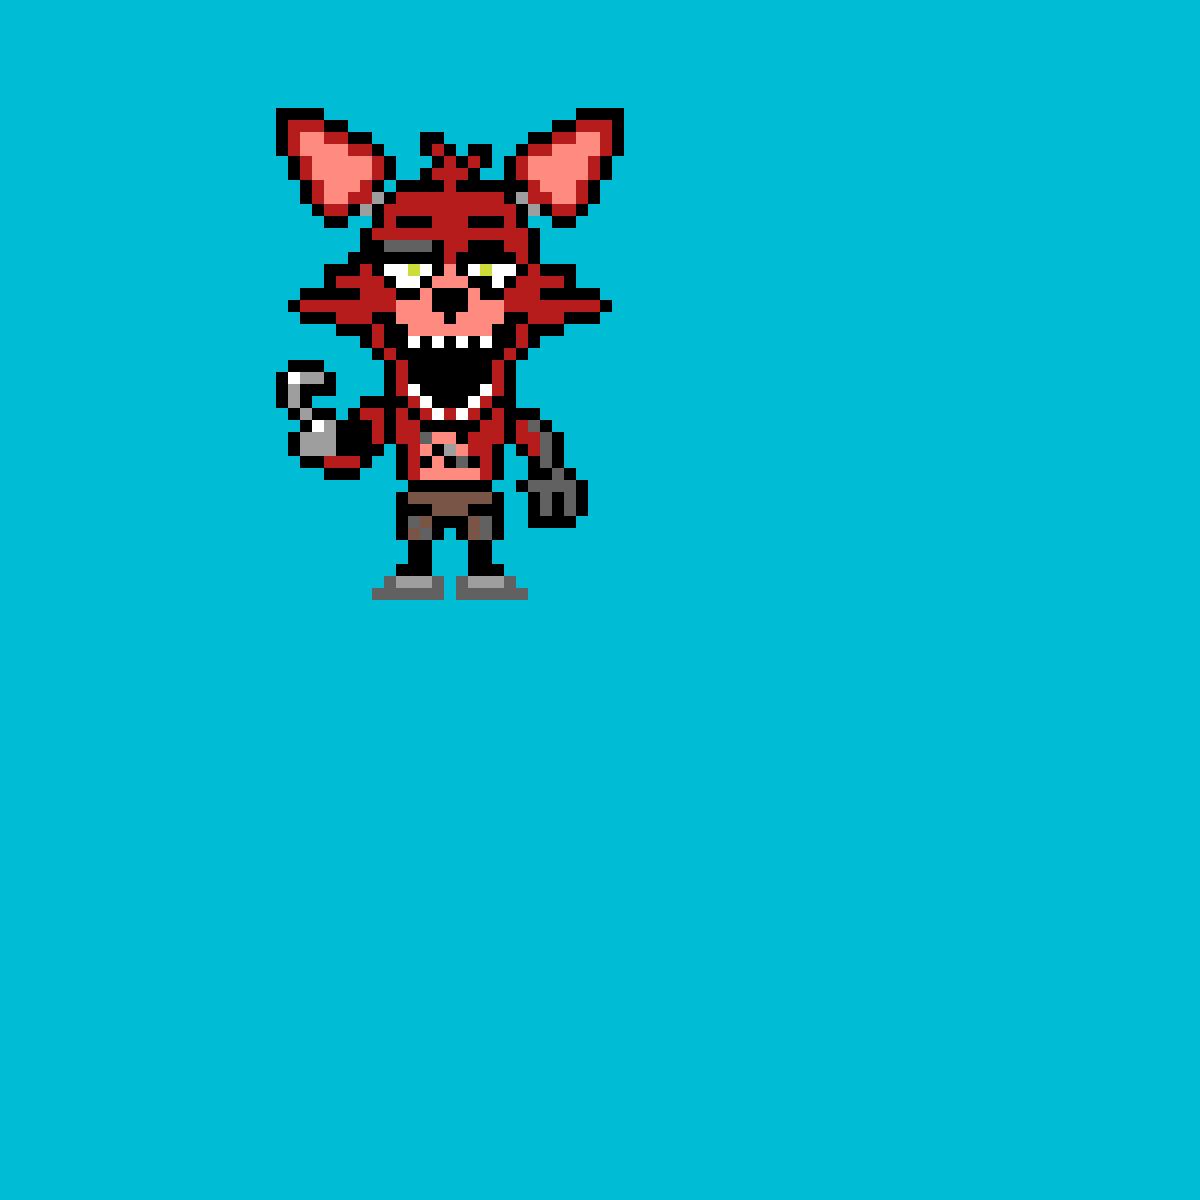 Foxy the Pirate Fox by TheTrueCandy